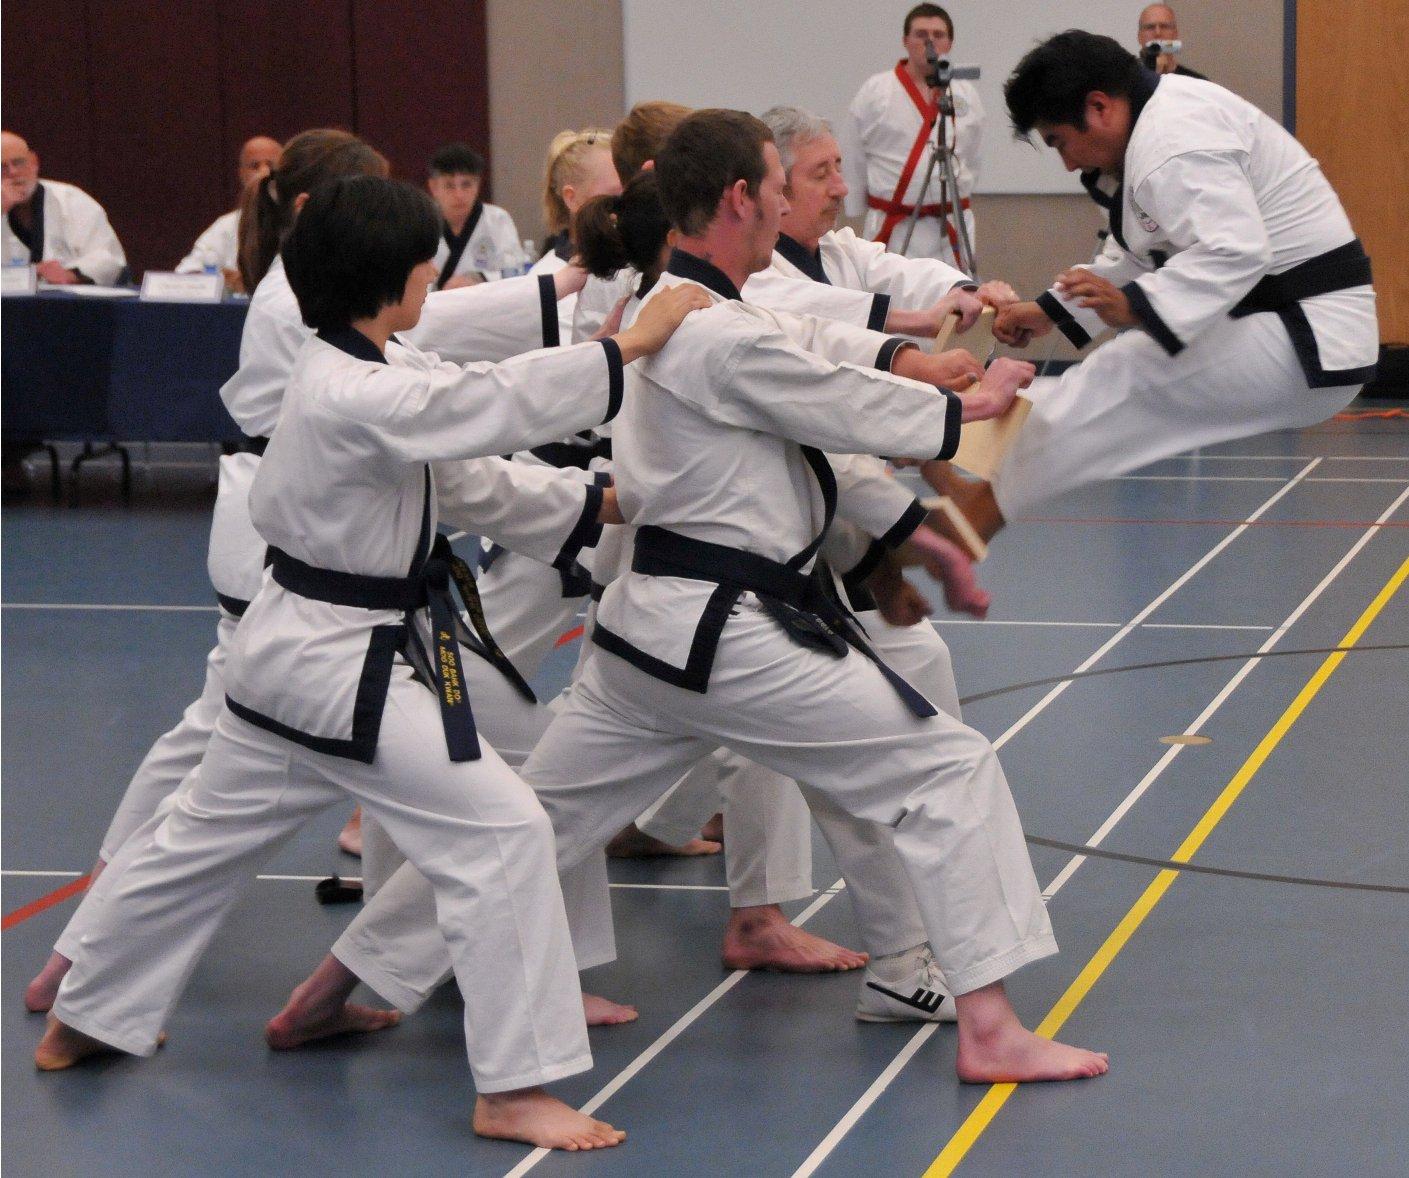 r10-dan-test-jump-kick-break